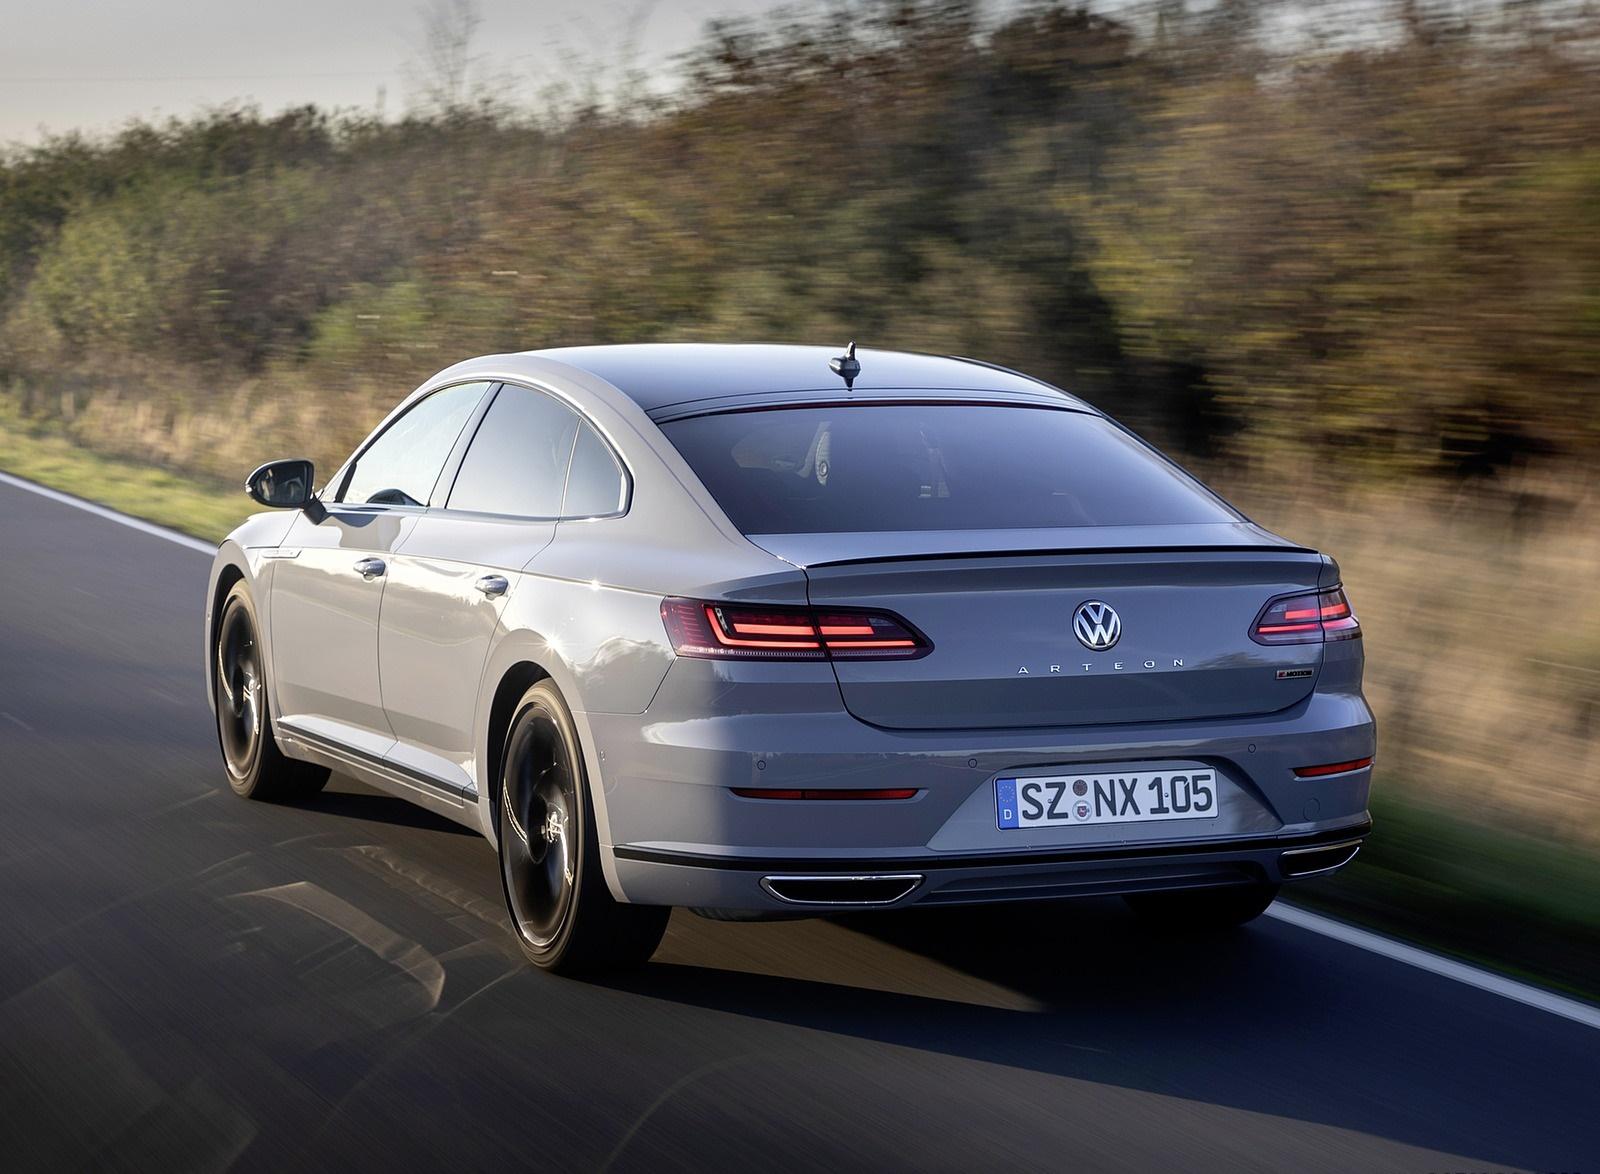 2020 Volkswagen Arteon R-Line Edition Rear Three-Quarter Wallpapers (7)